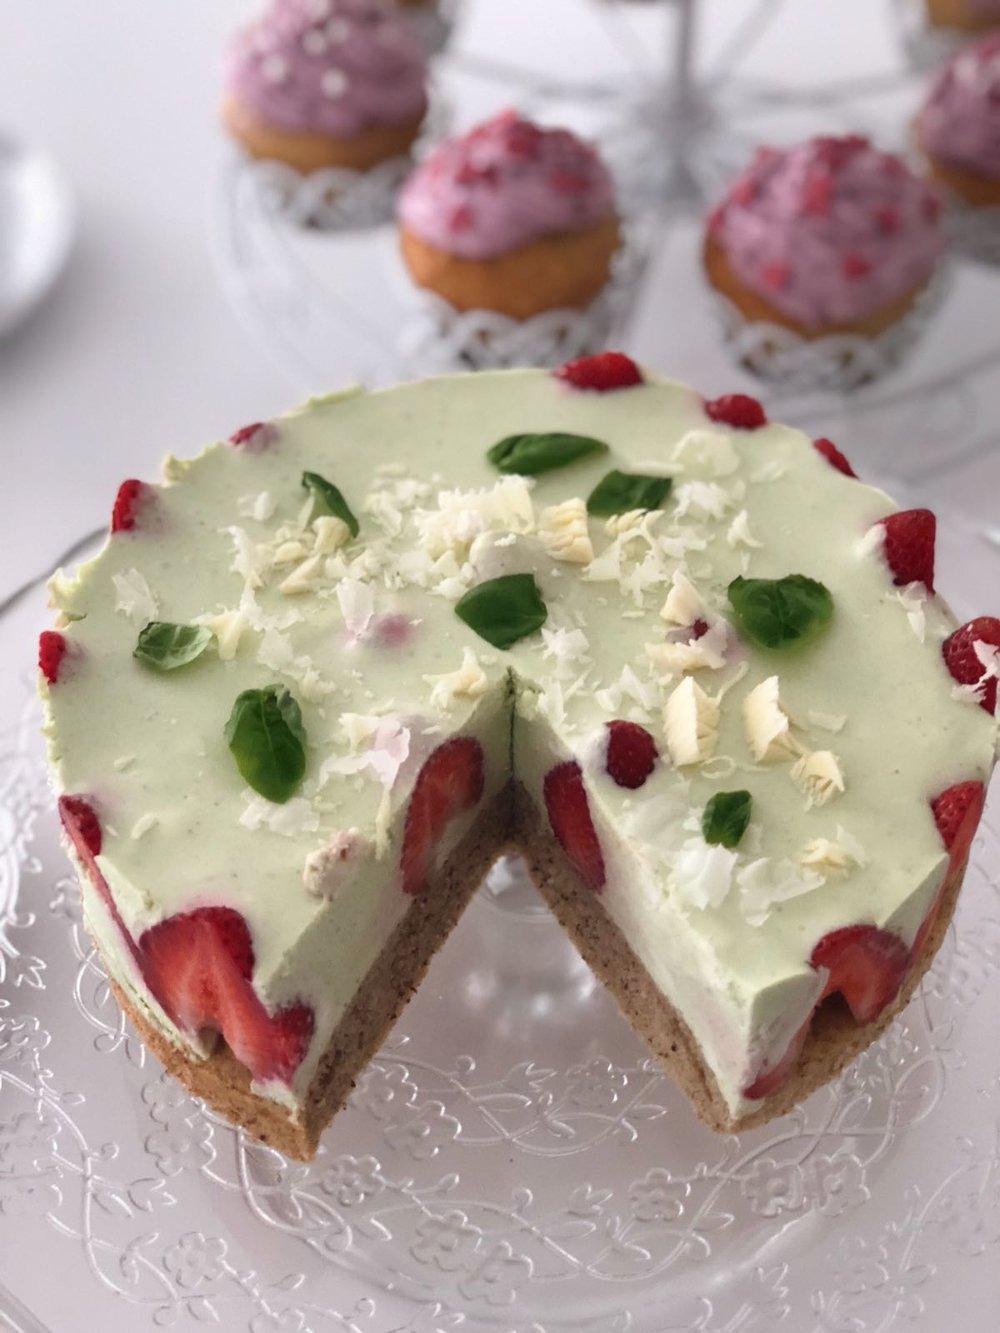 Erdbeer-Basilikum-Torte2.jpg